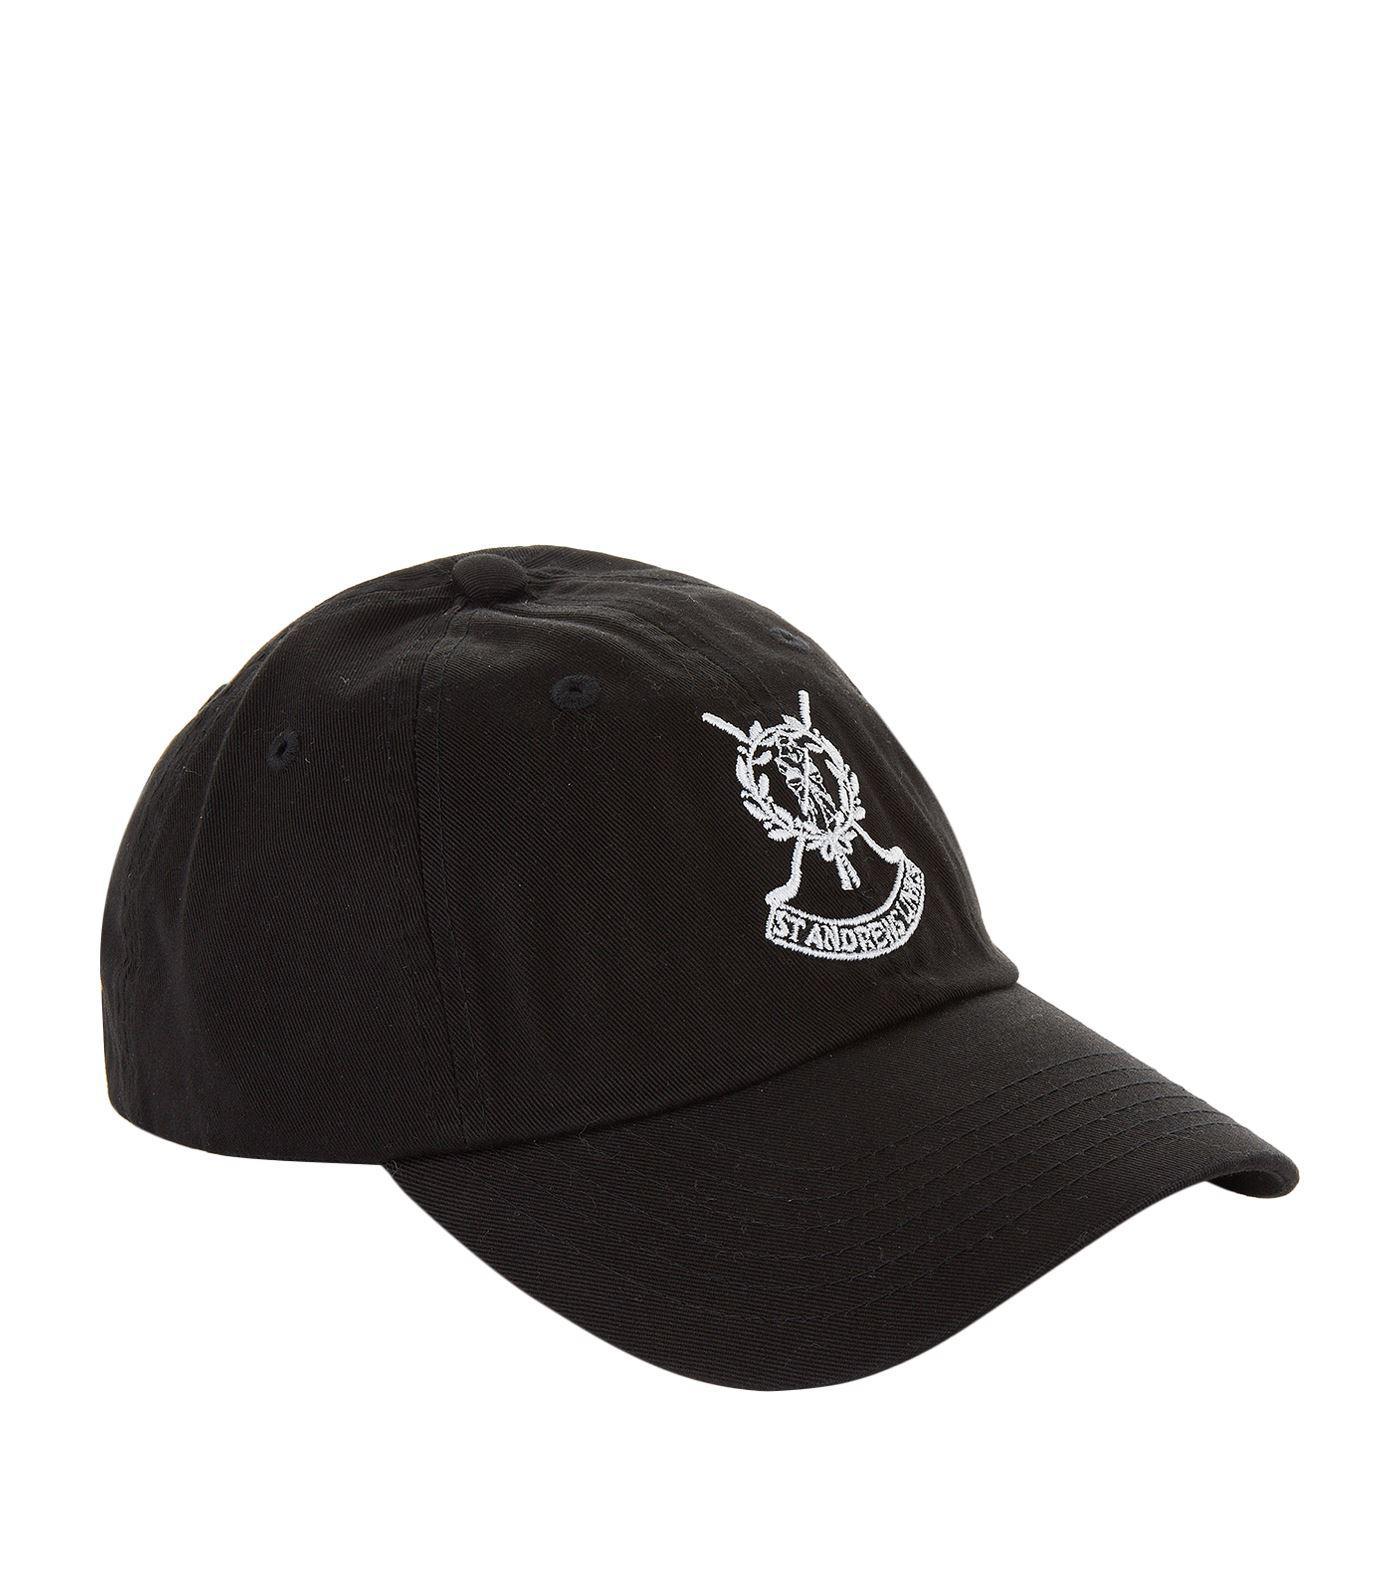 75a8dfeff81 Harrods St Andrews Links Golf Cap in Black for Men - Lyst